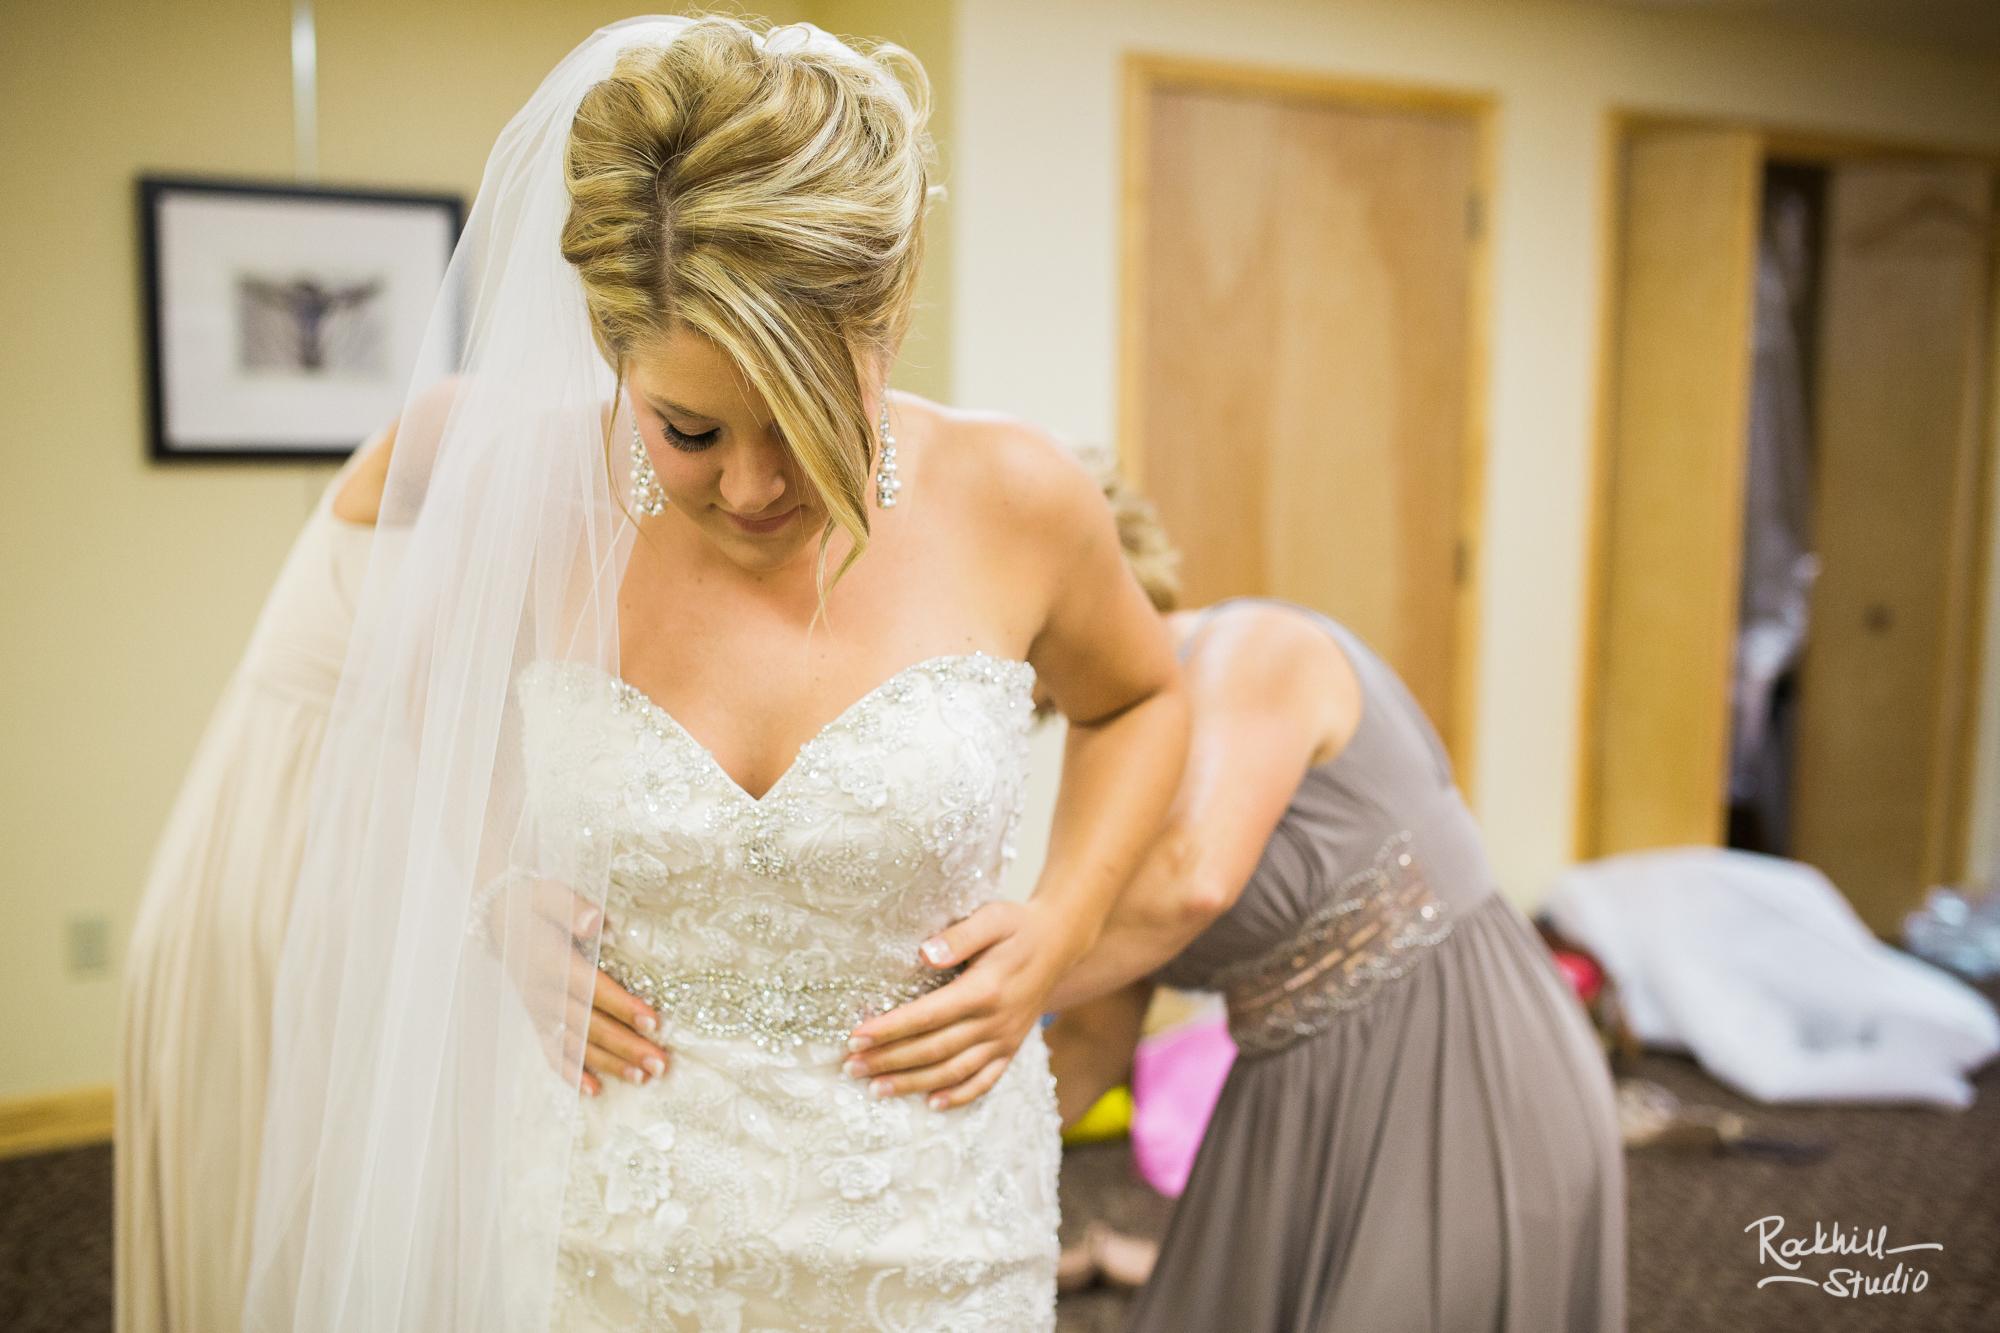 bridal-getting-ready-picutres-rockhill-studio-upper-peninsula-wedding-marquette.jpg